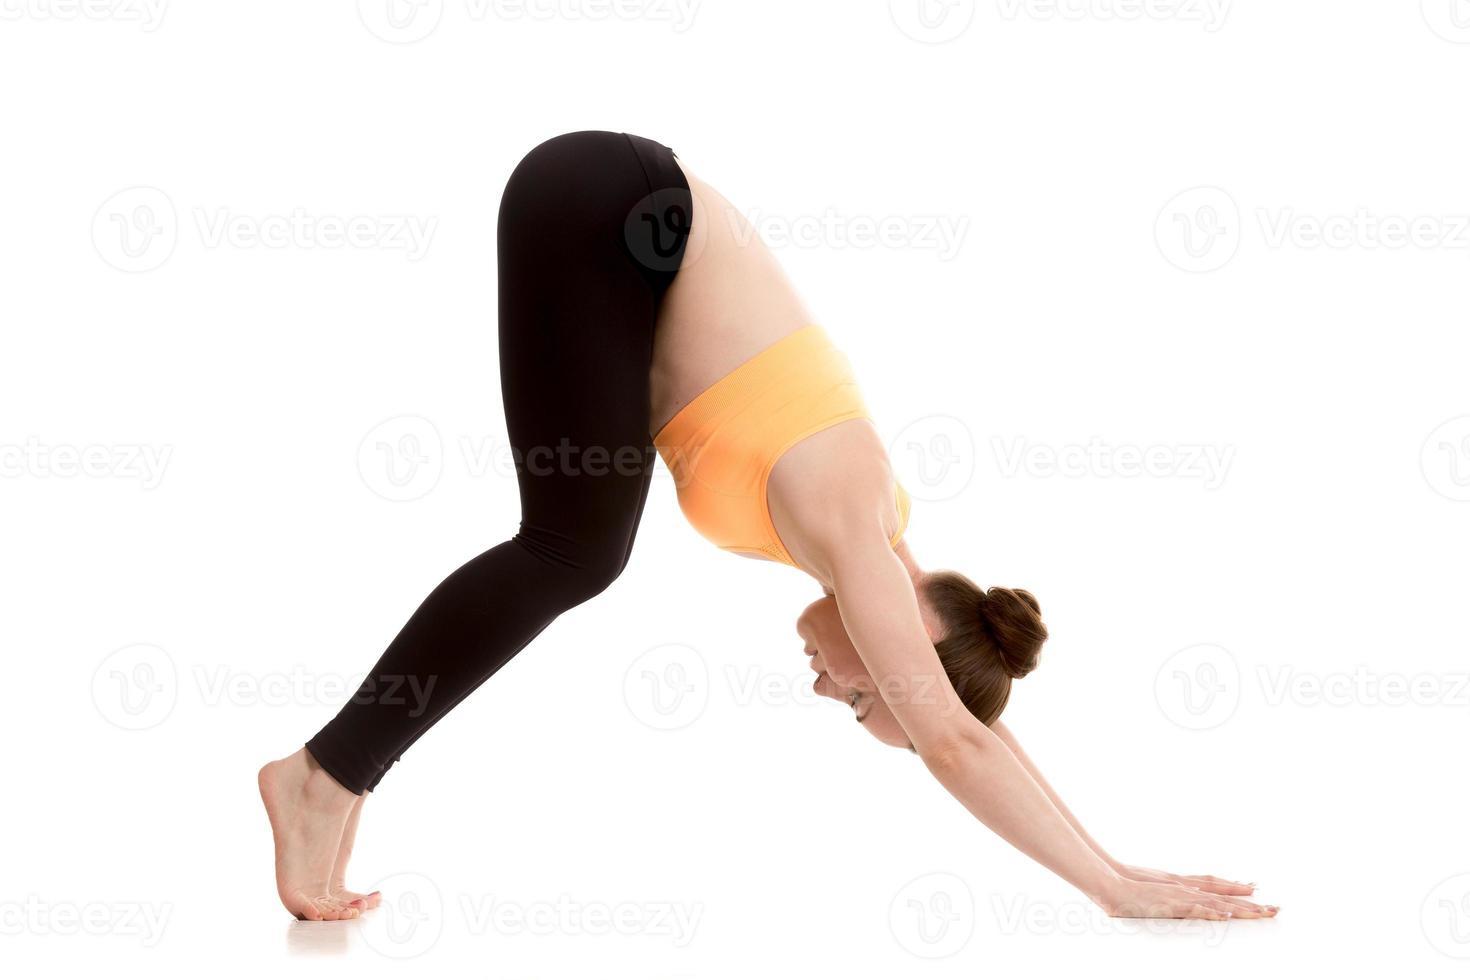 Downward-facing dog yoga pose for beginner photo